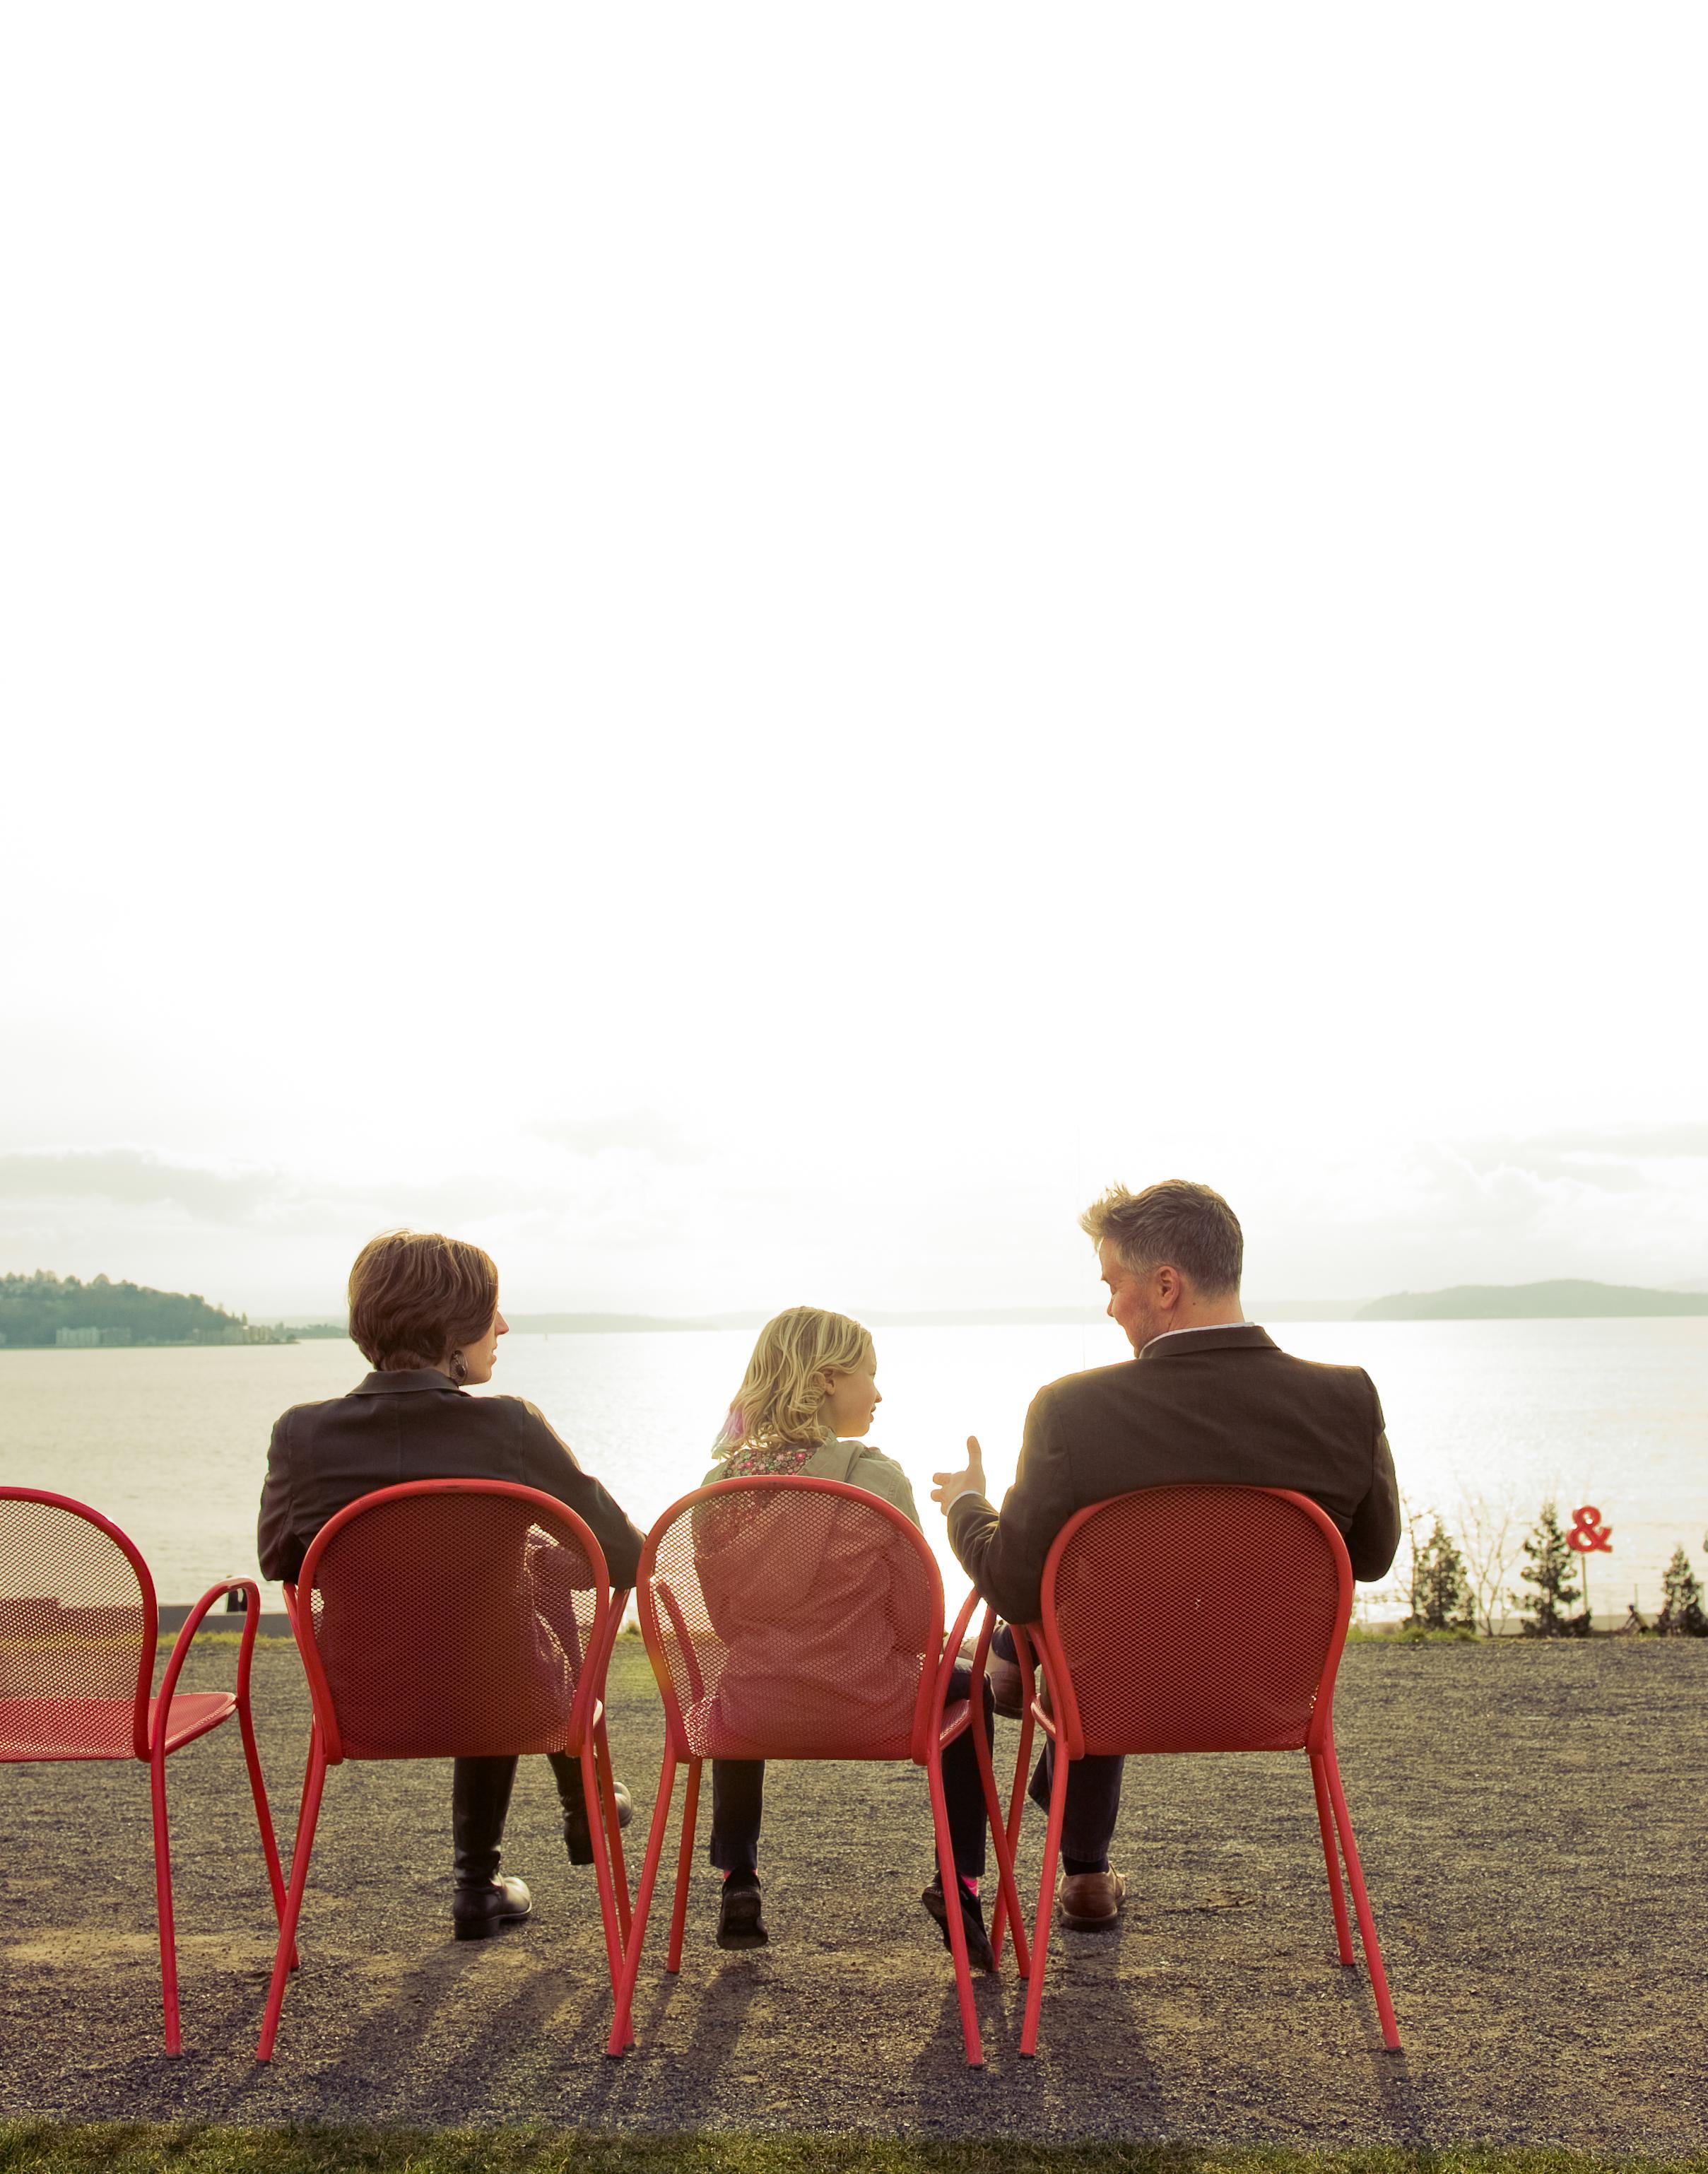 seattle-family-portrait-photographer-12.jpg